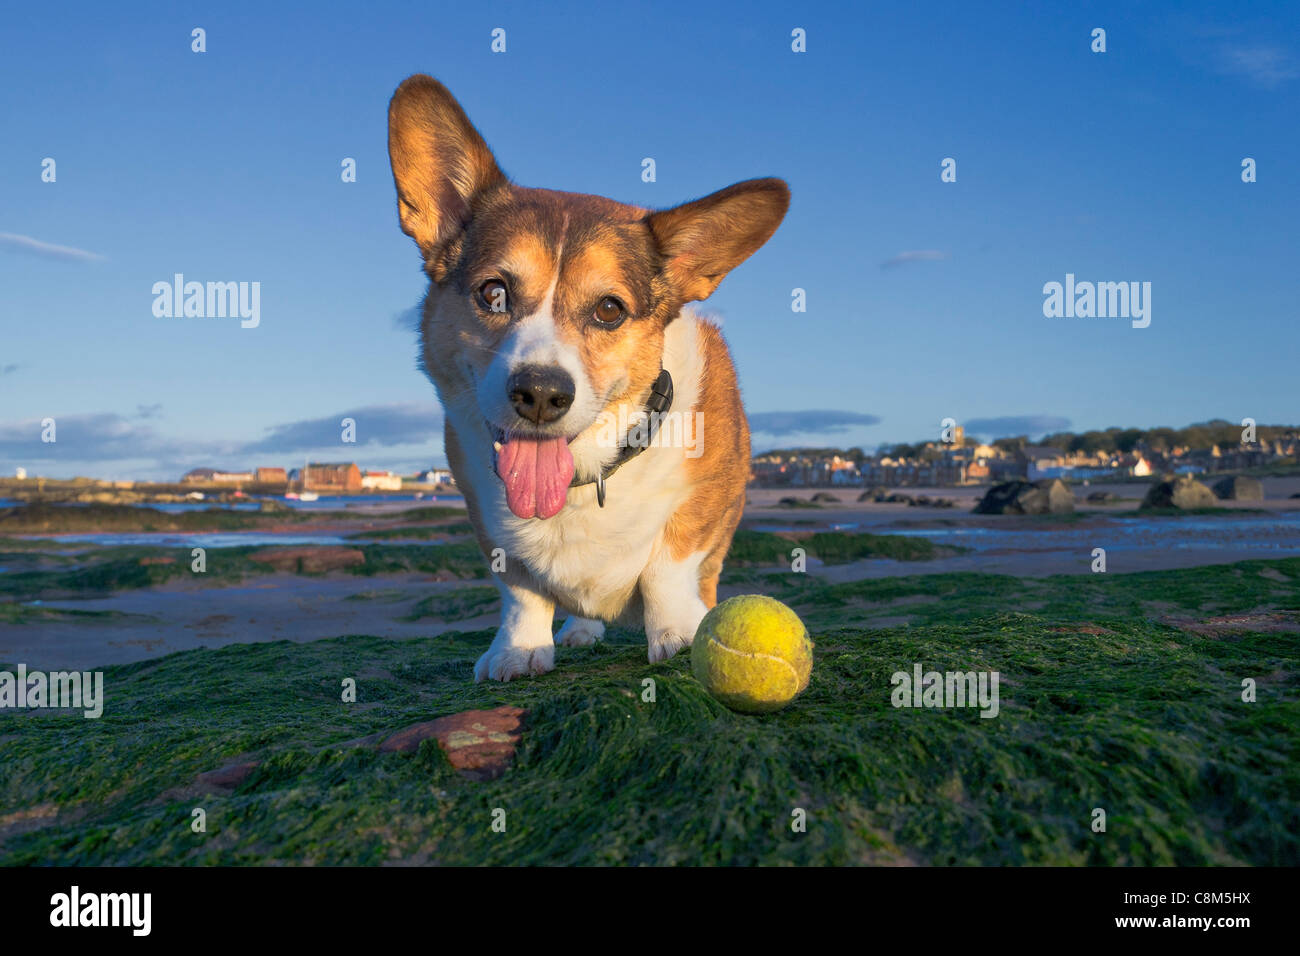 Male cardigan corgi (dog) playing with a tennis ball on the beach. - Stock Image